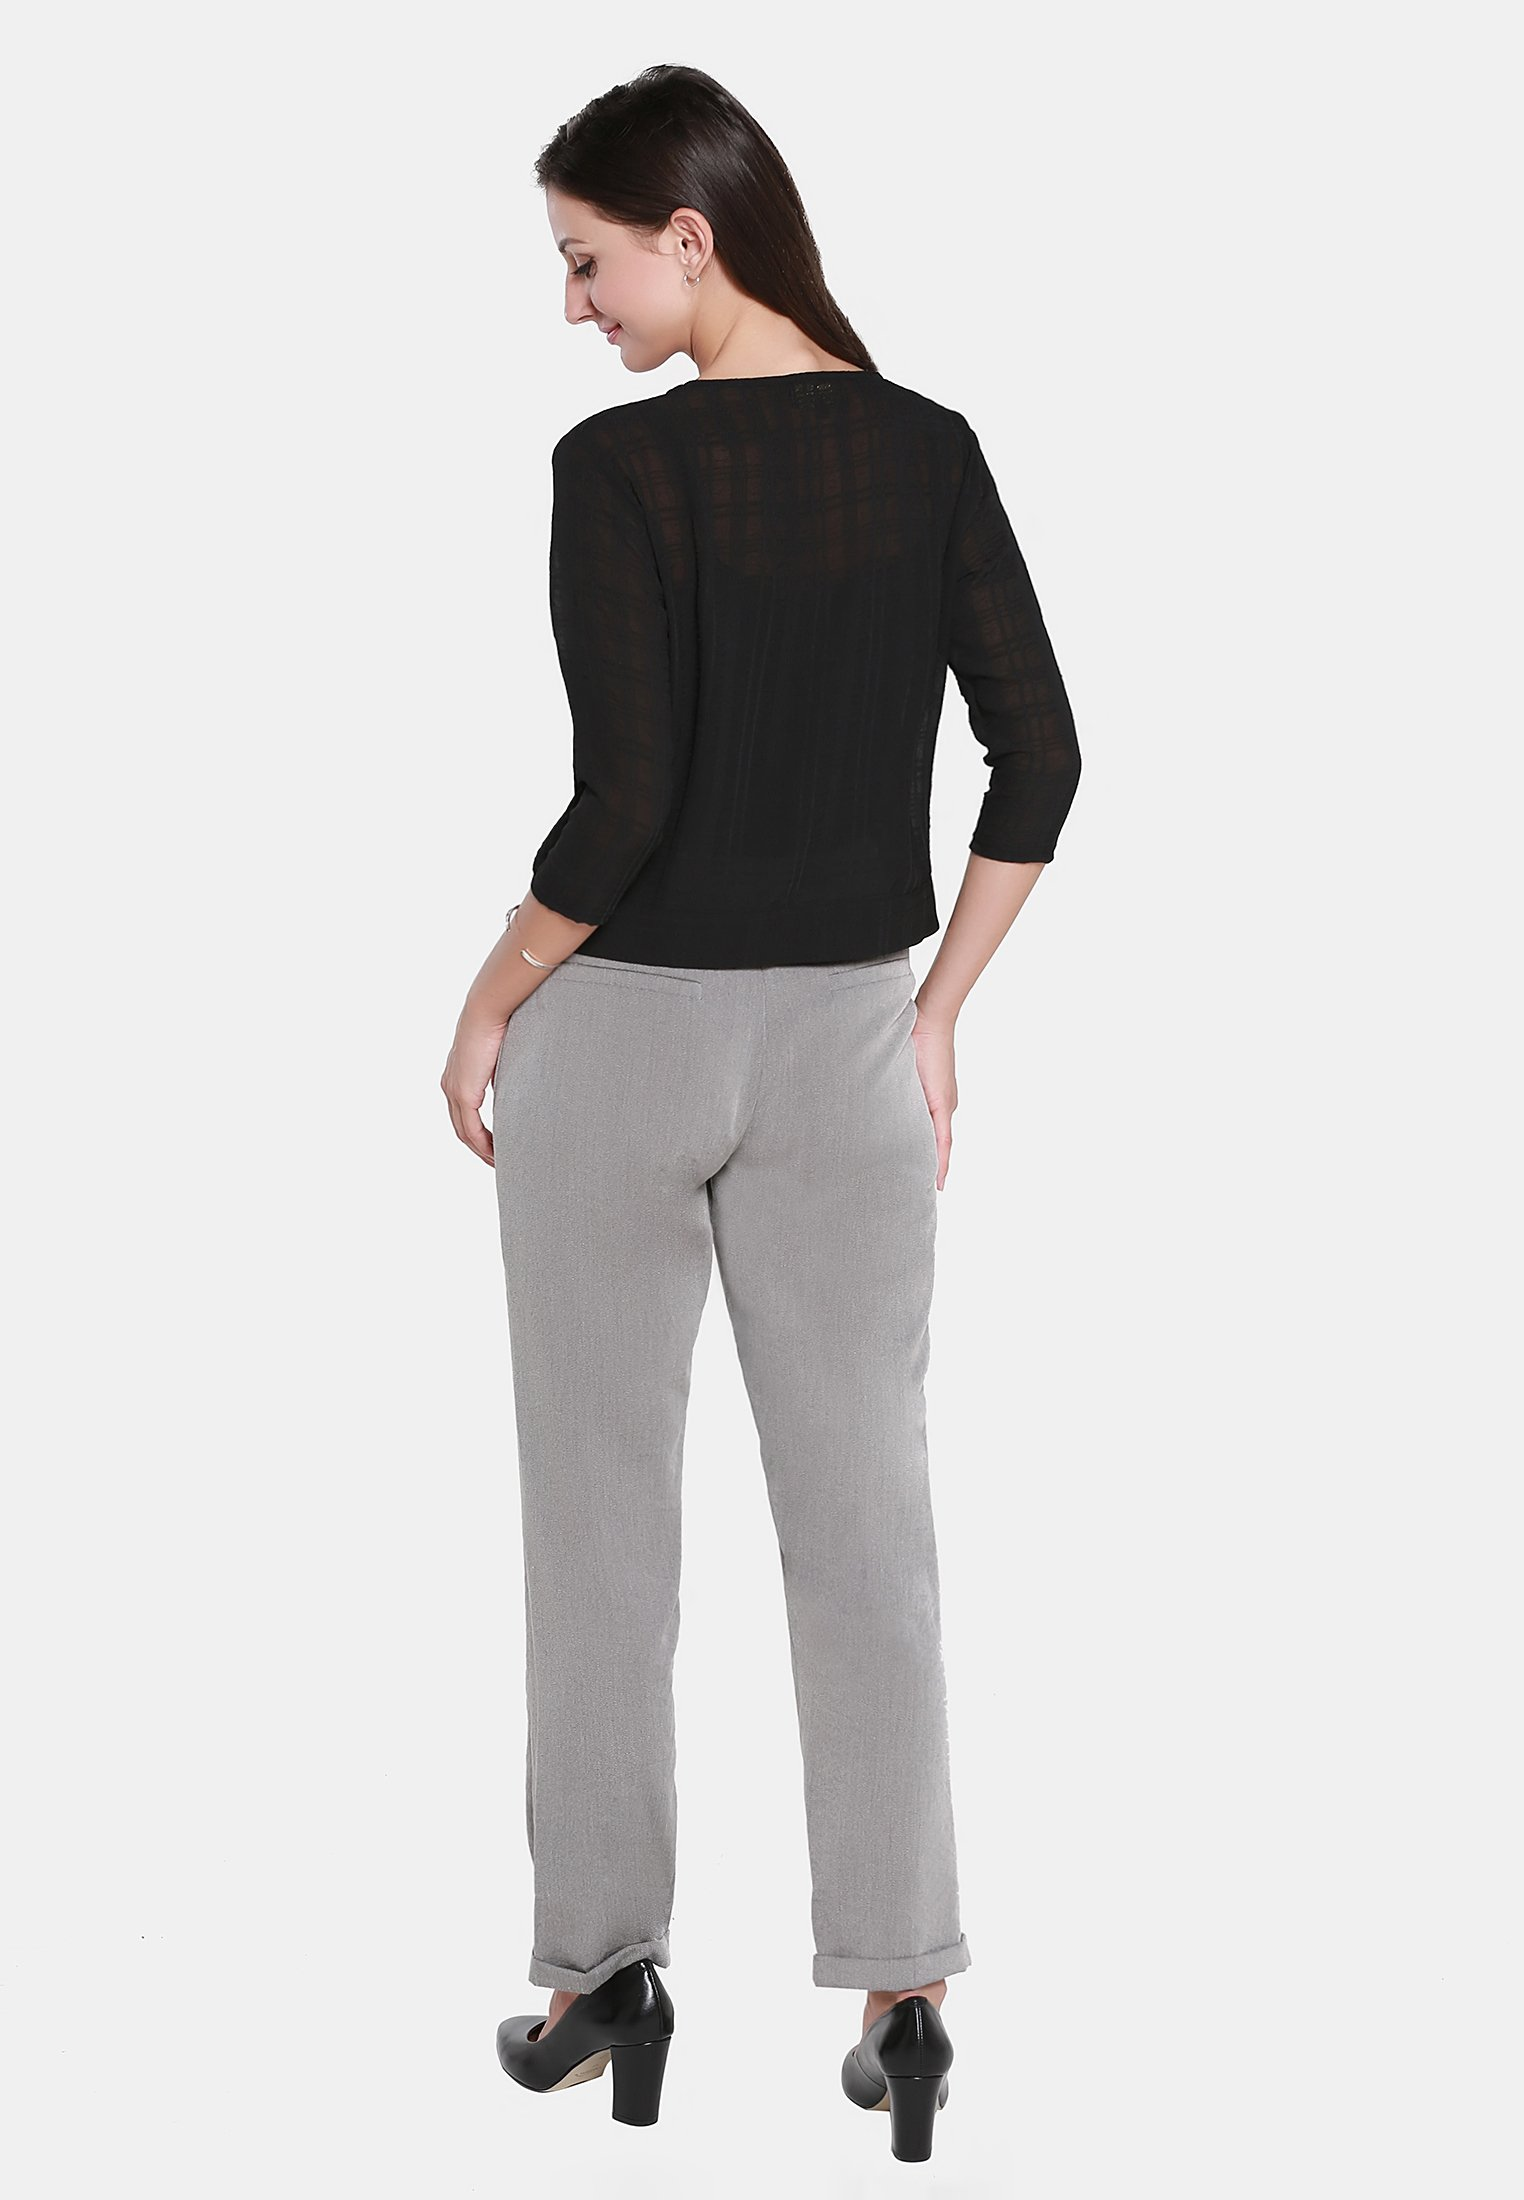 Shopping Online Women's Clothing usha Cardigan black rfaIL2w8O